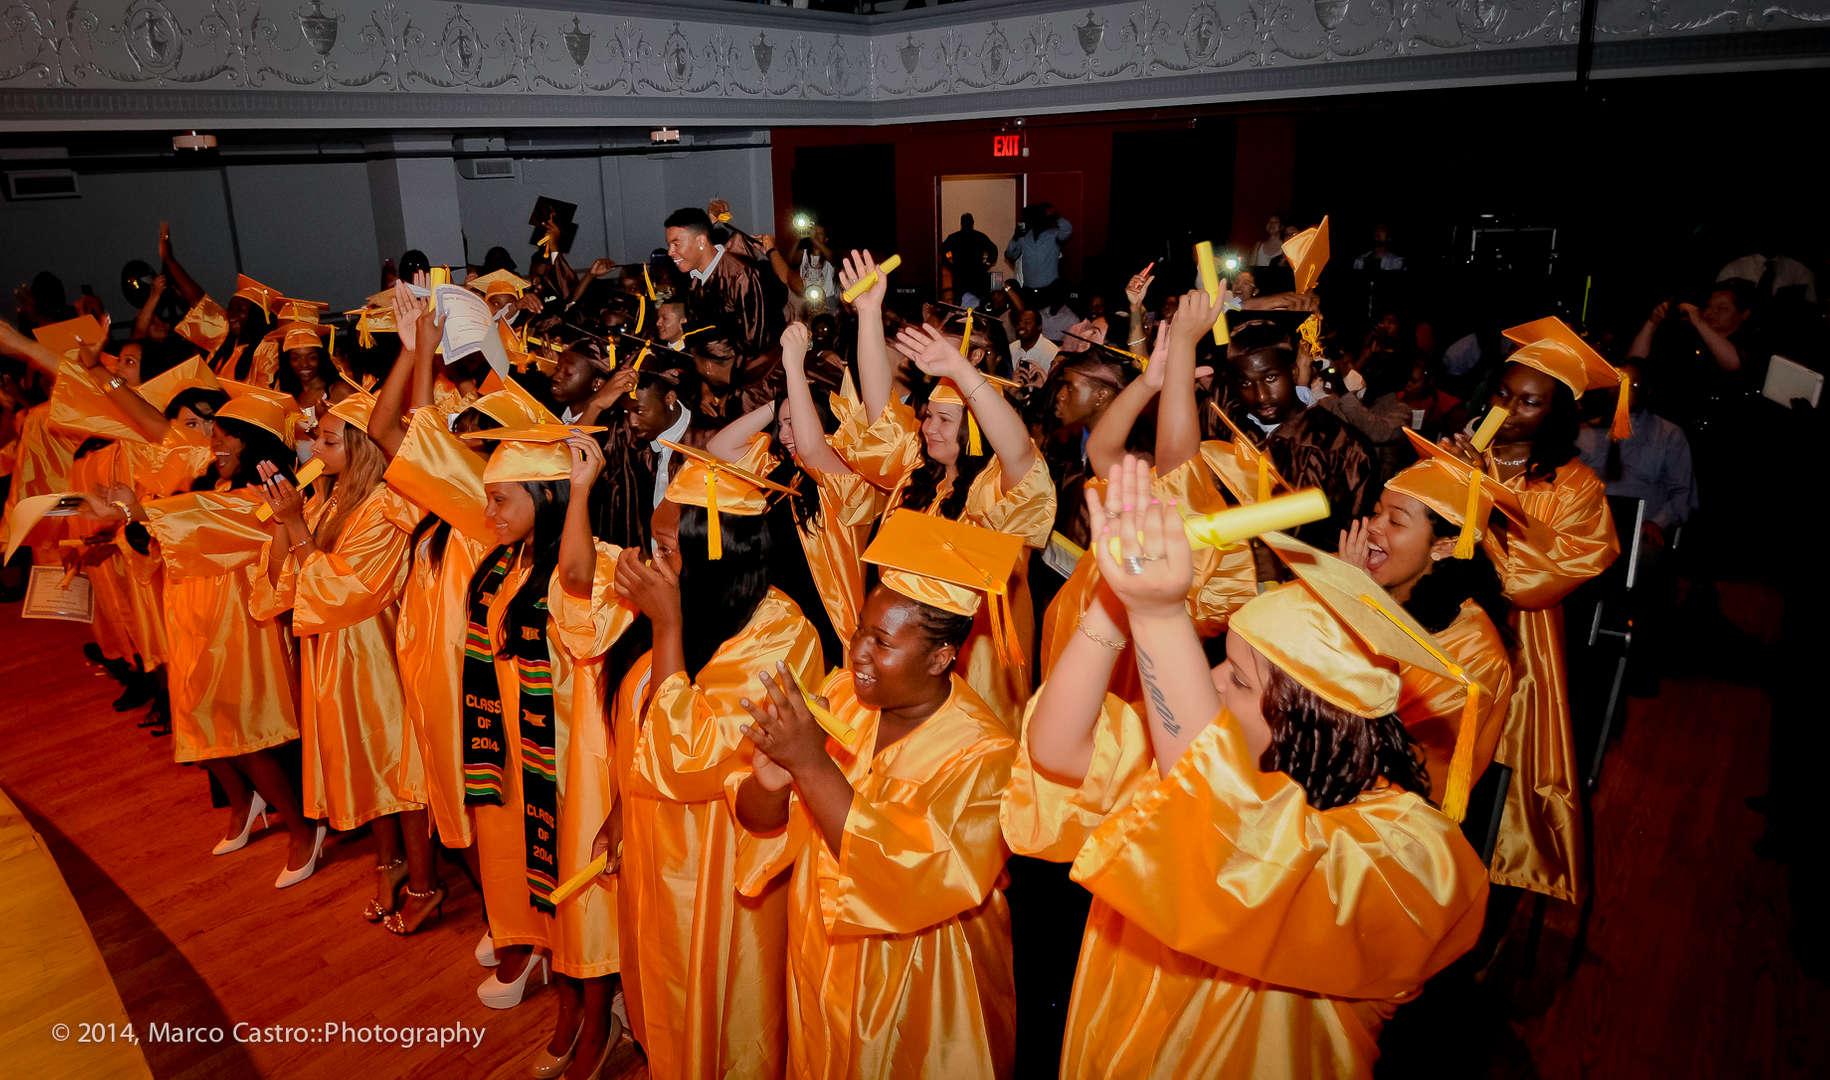 Seniors celebrating during graduation